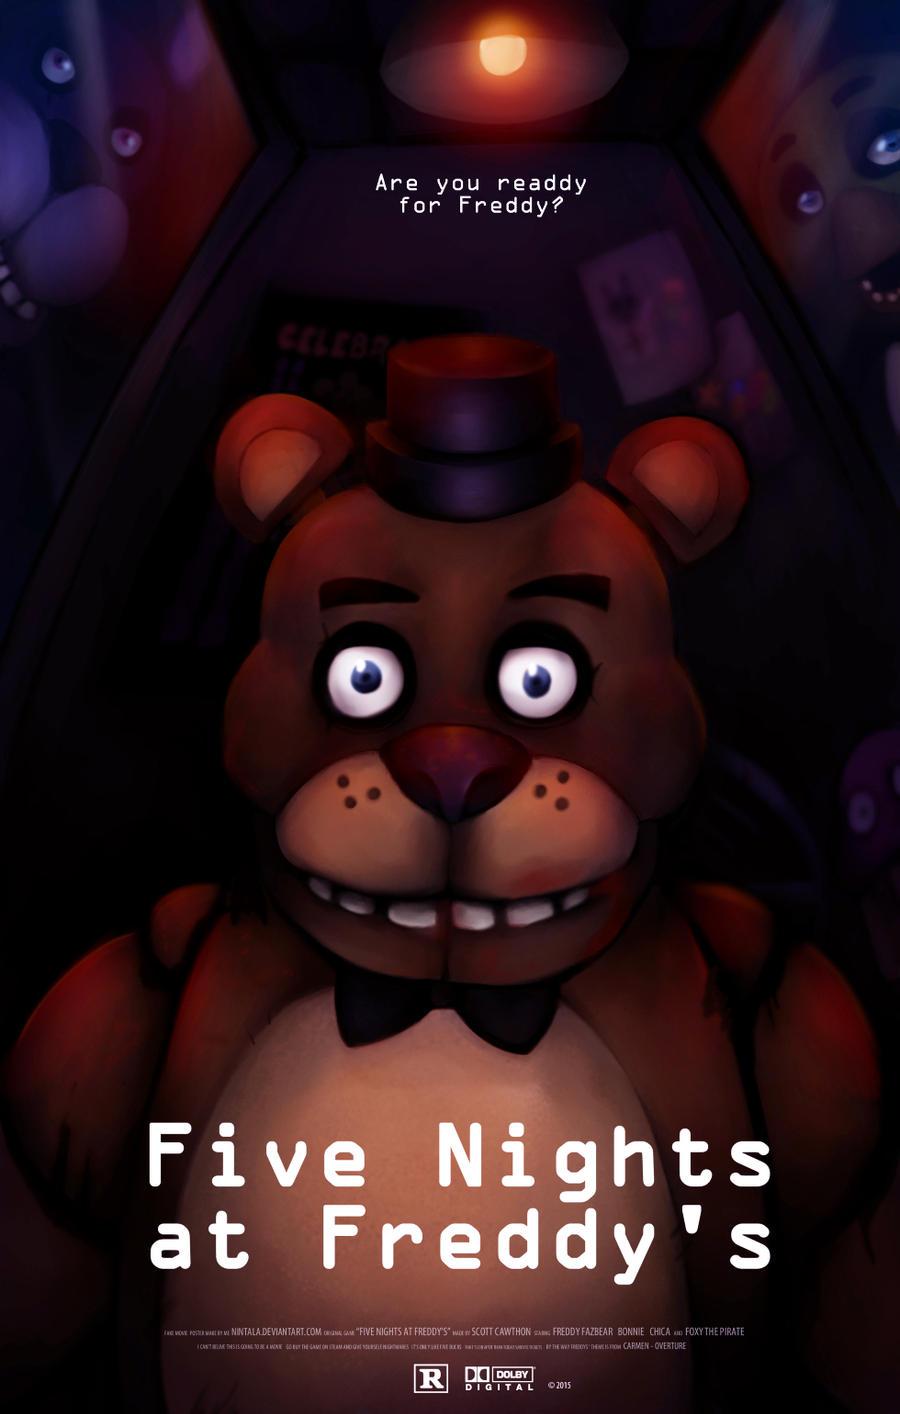 Freddy fazbears day off by nintala on deviantart